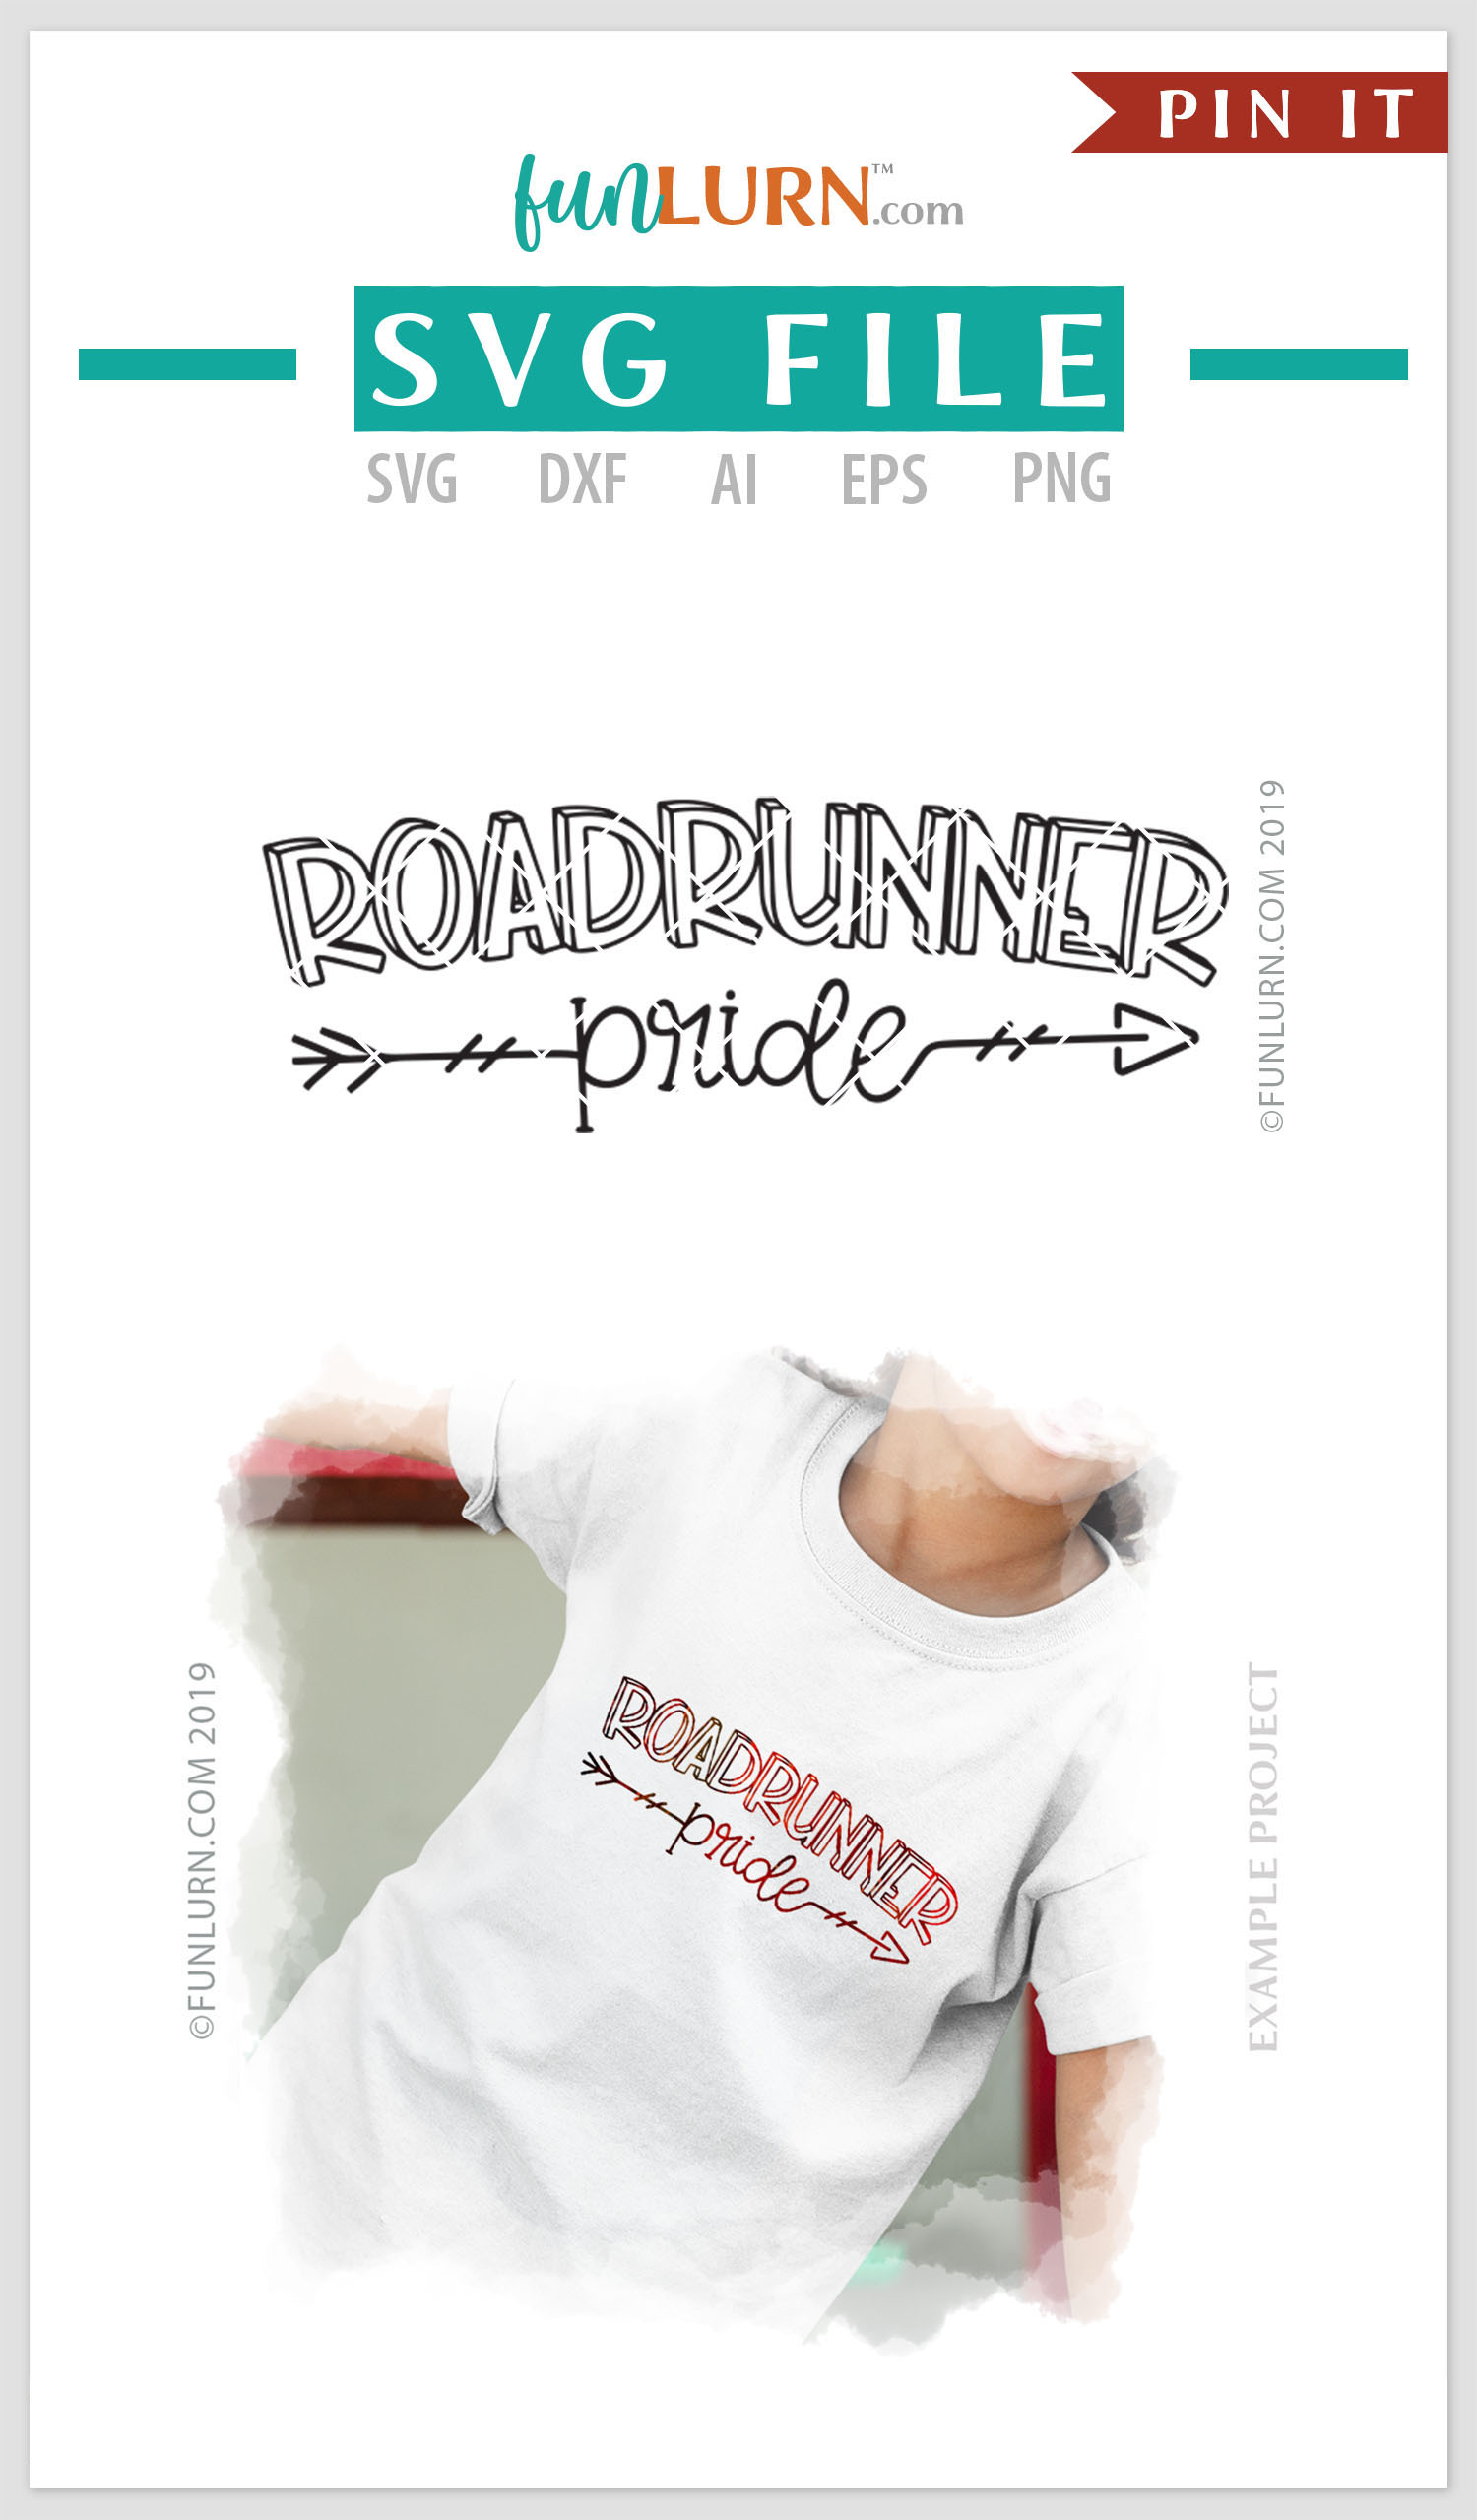 Roadrunner Pride Team SVG Cut File example image 4